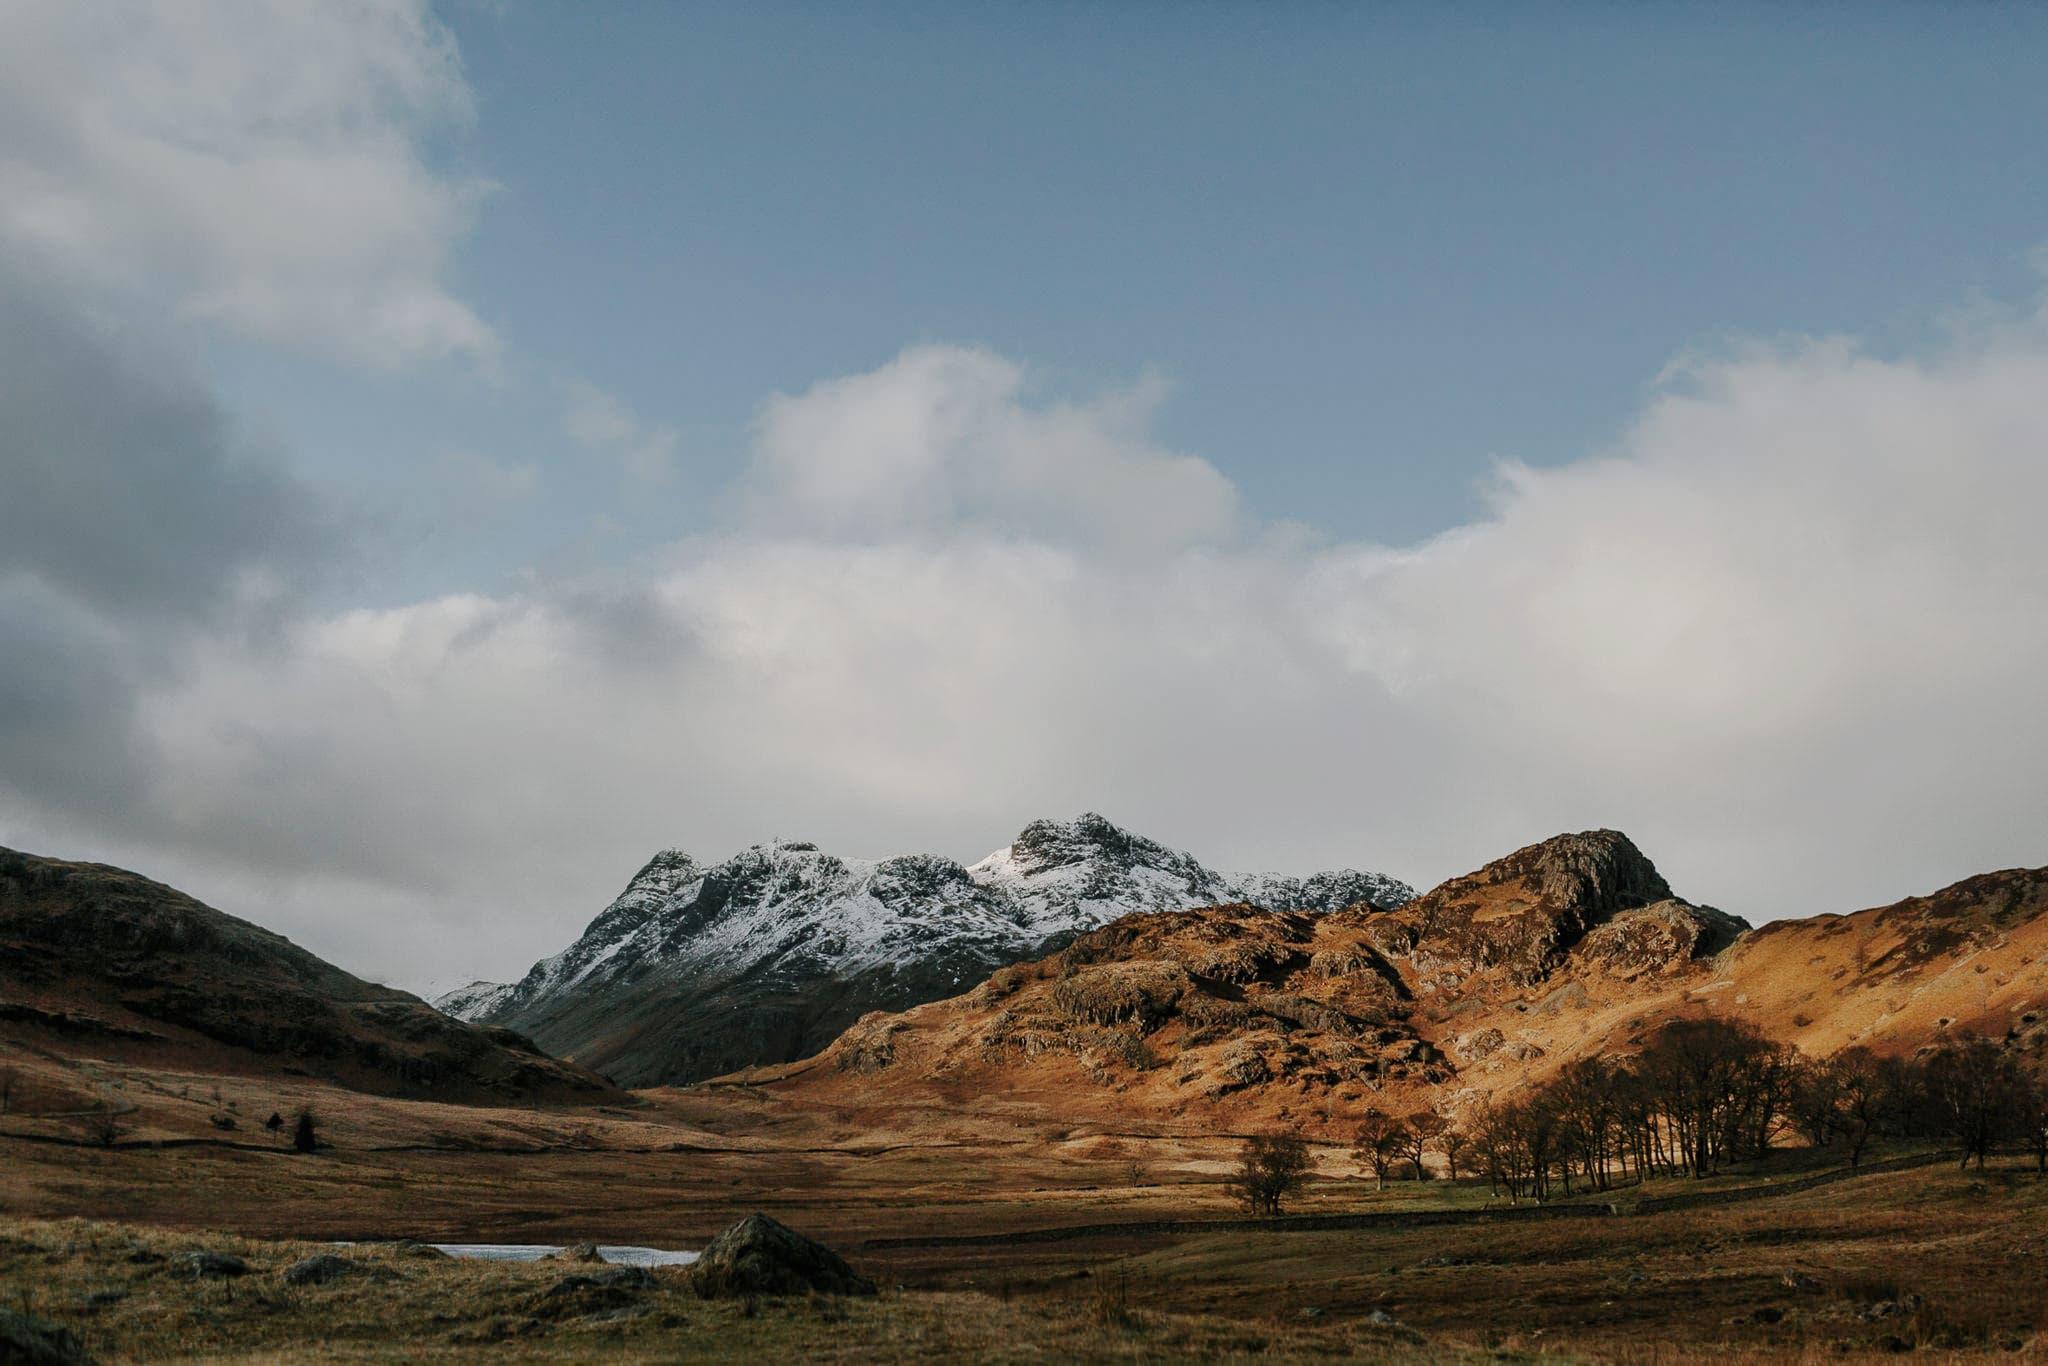 Blea Tarn mountain views